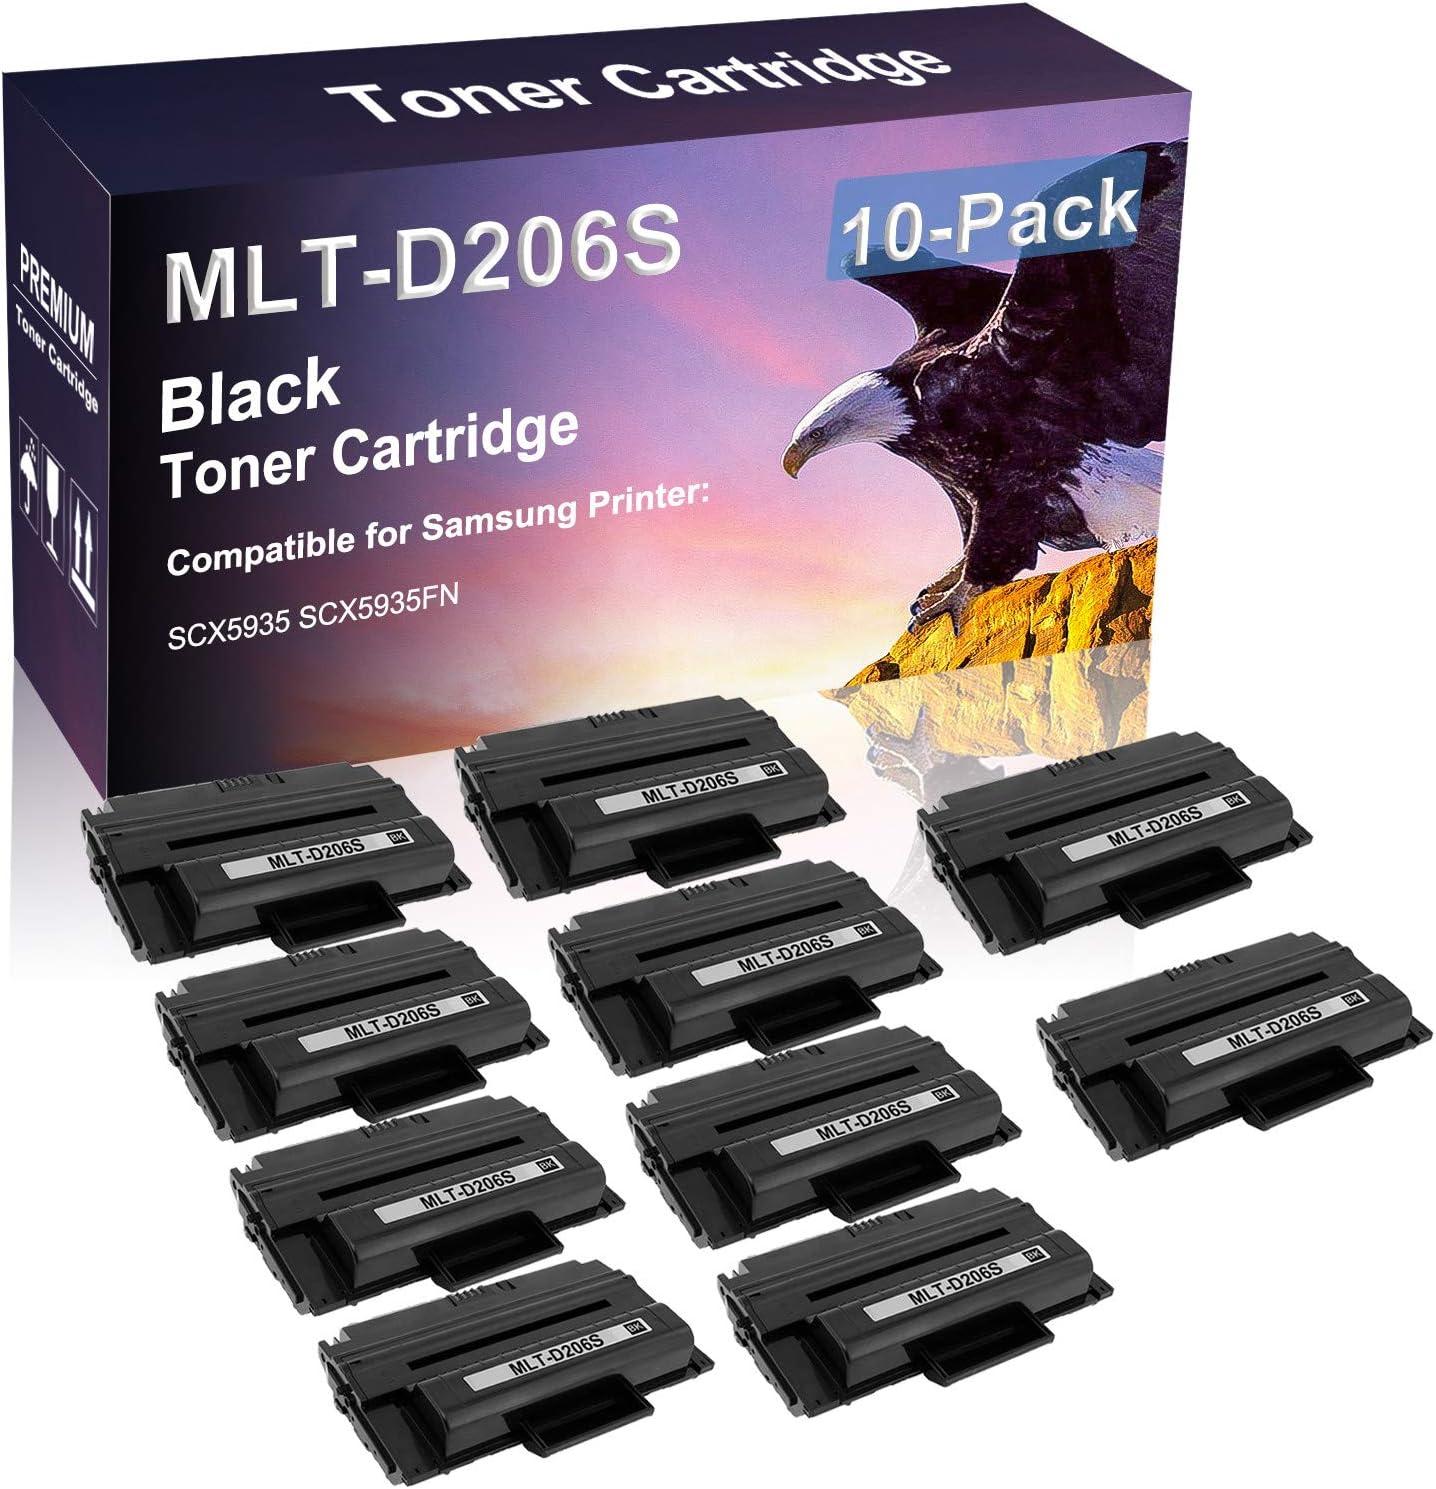 10 Pack (Black) Compatible High Capacity D206S MLT-D206S Printer Toner Cartridge Use for Samsung SCX5935 SCX5935FN Printer